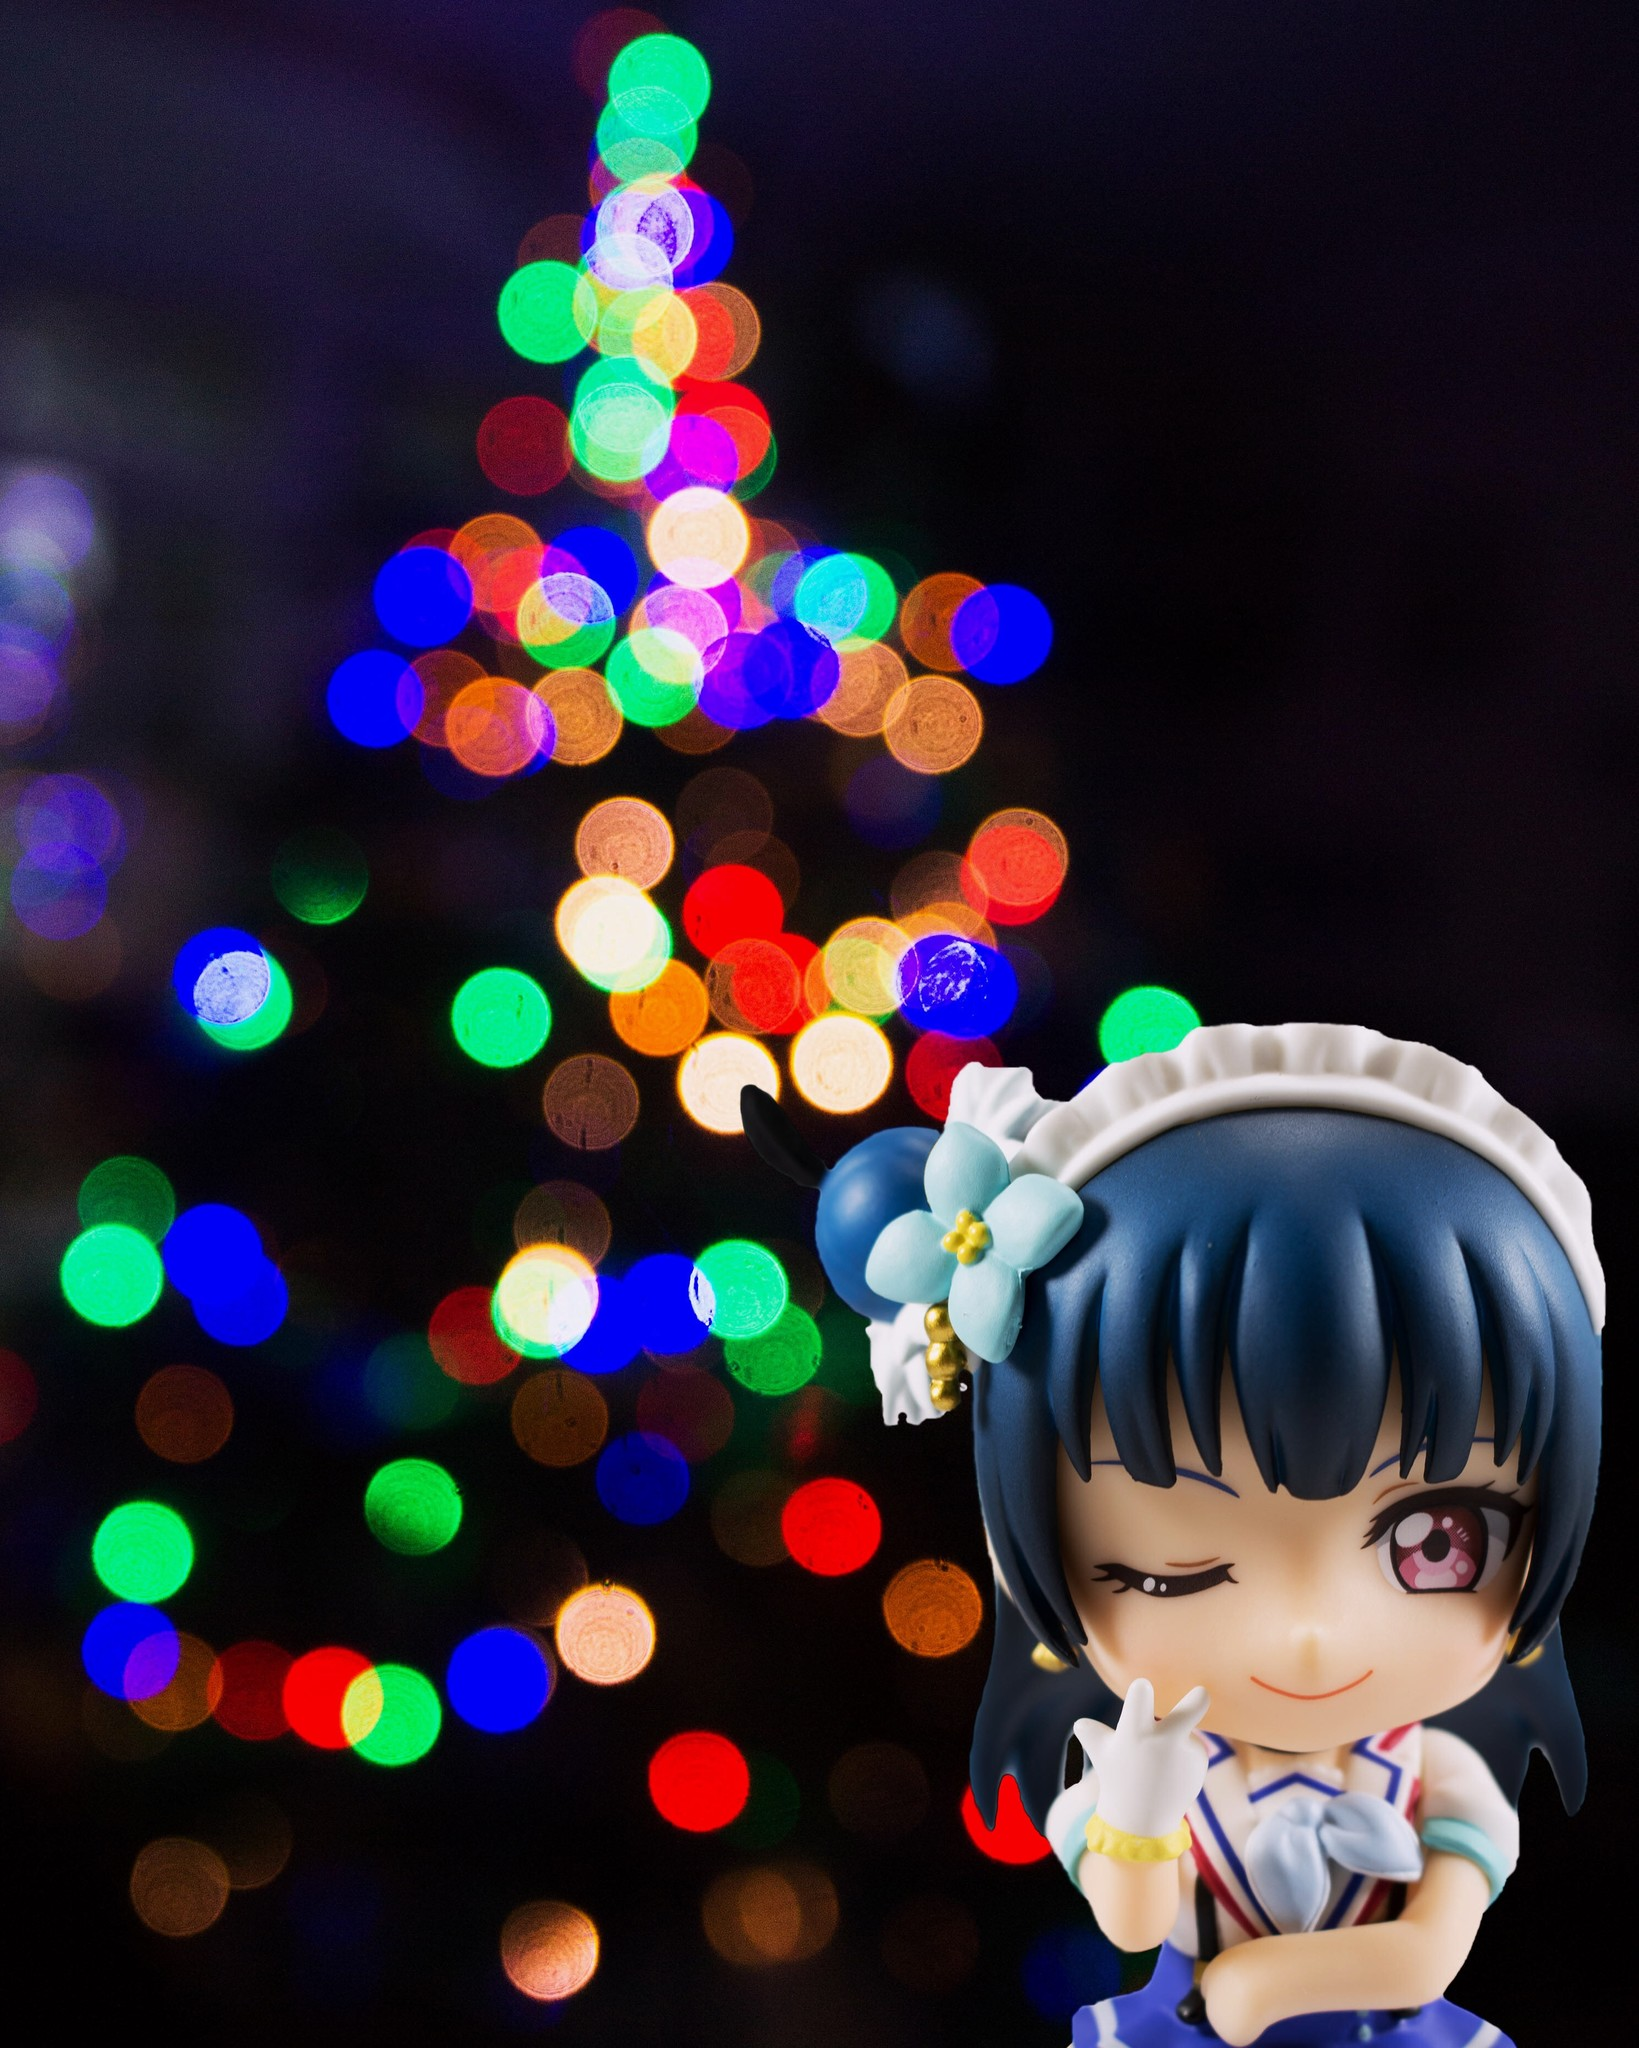 nendoroid good_smile_company nendoron shichibee love_live!_sunshine!! tsushima_yoshiko